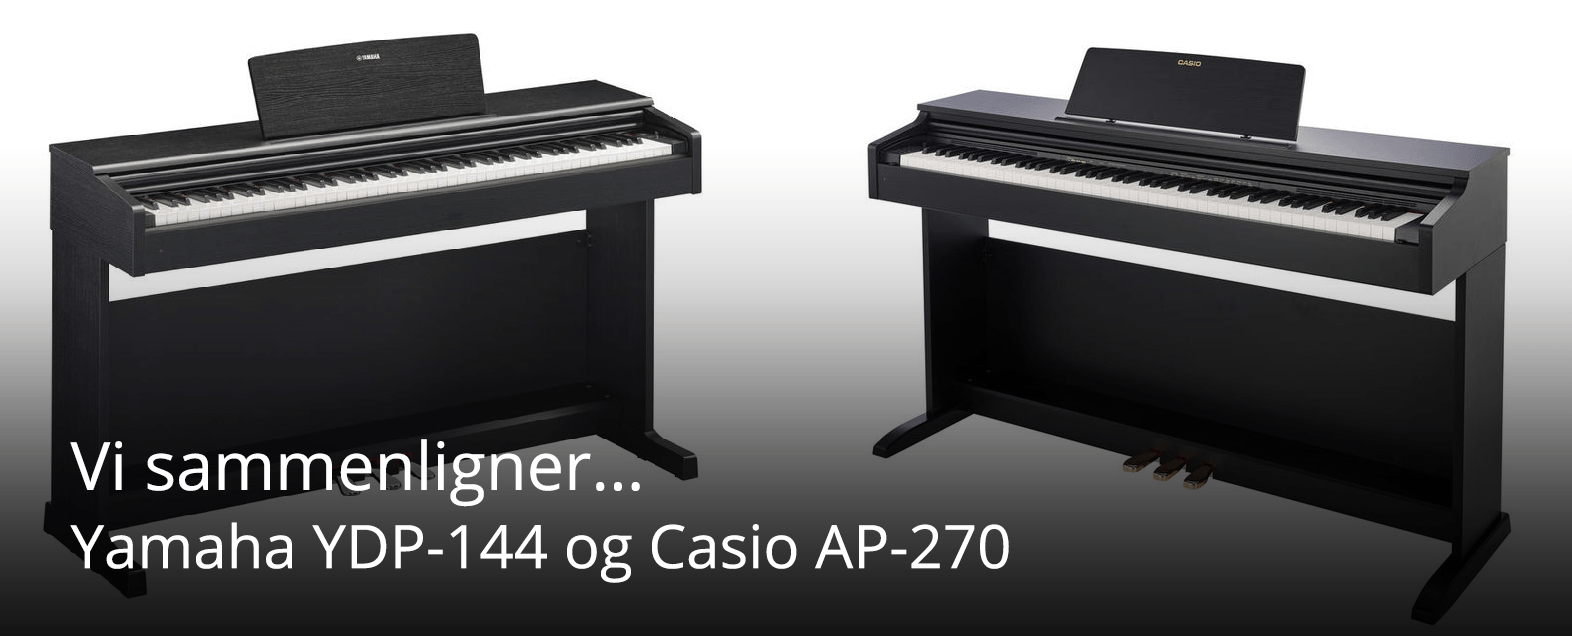 Yamaha YDP-144 - Casio AP-270